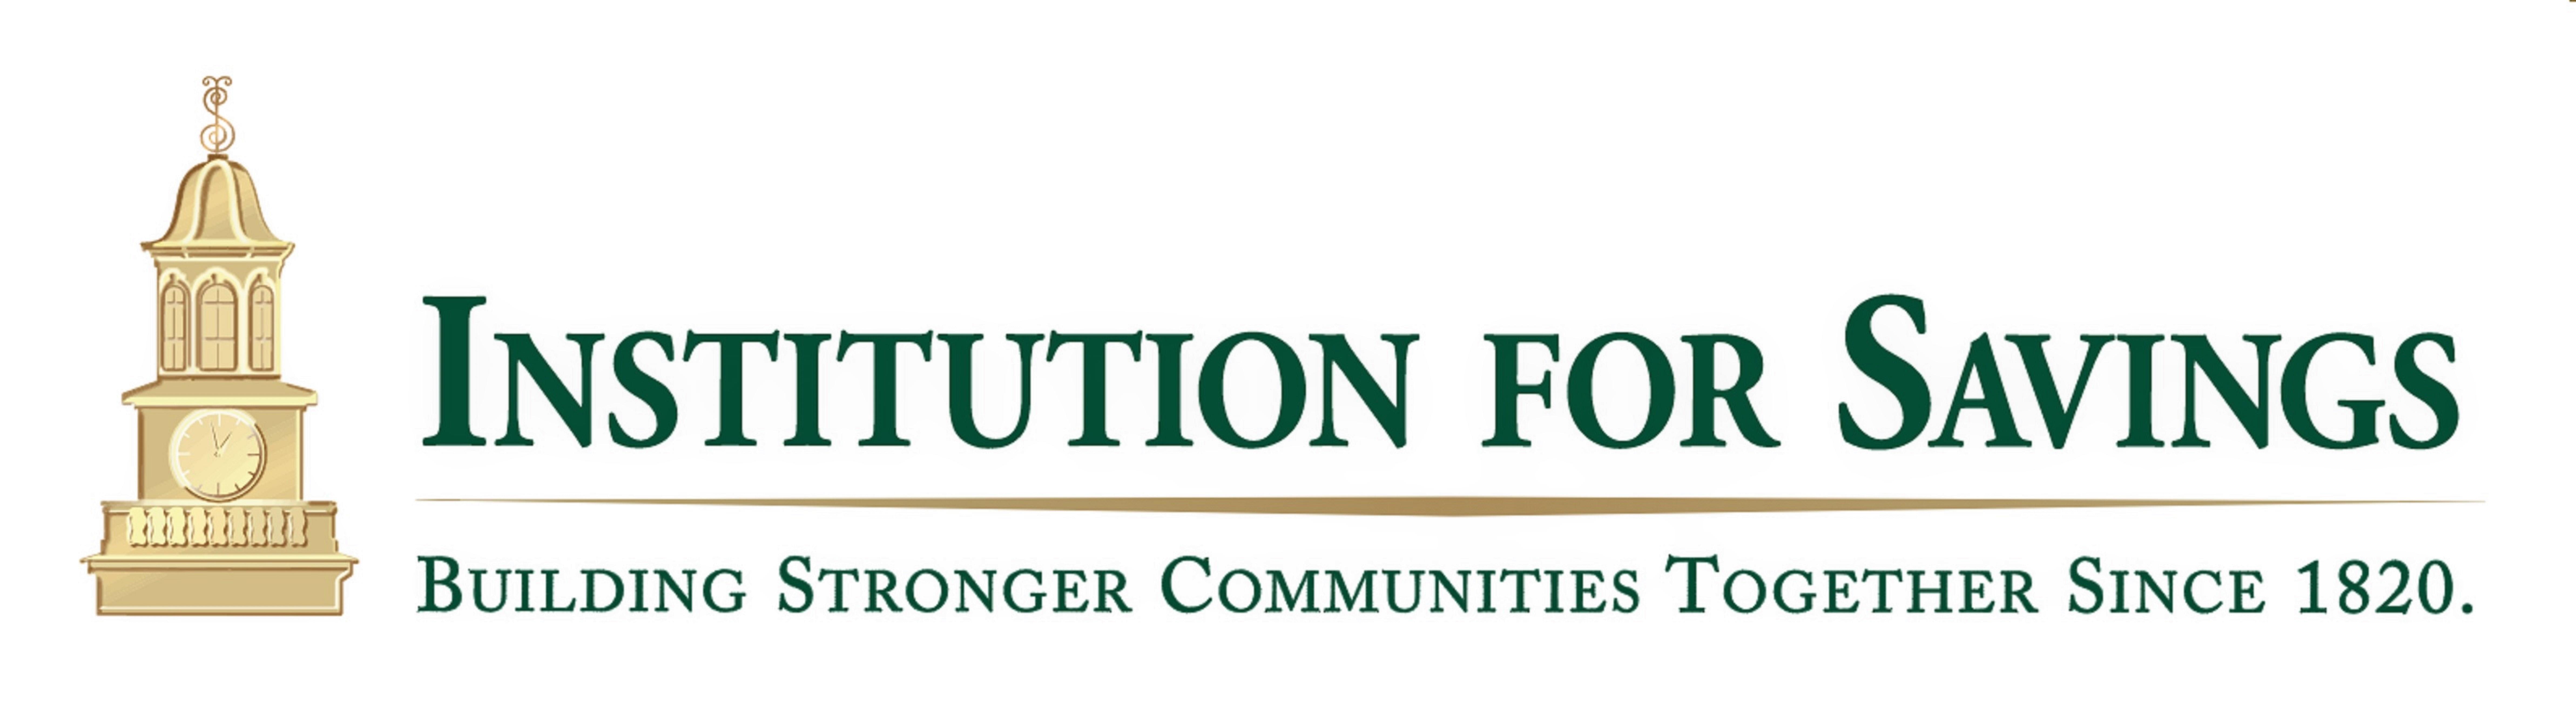 Institution for Savings